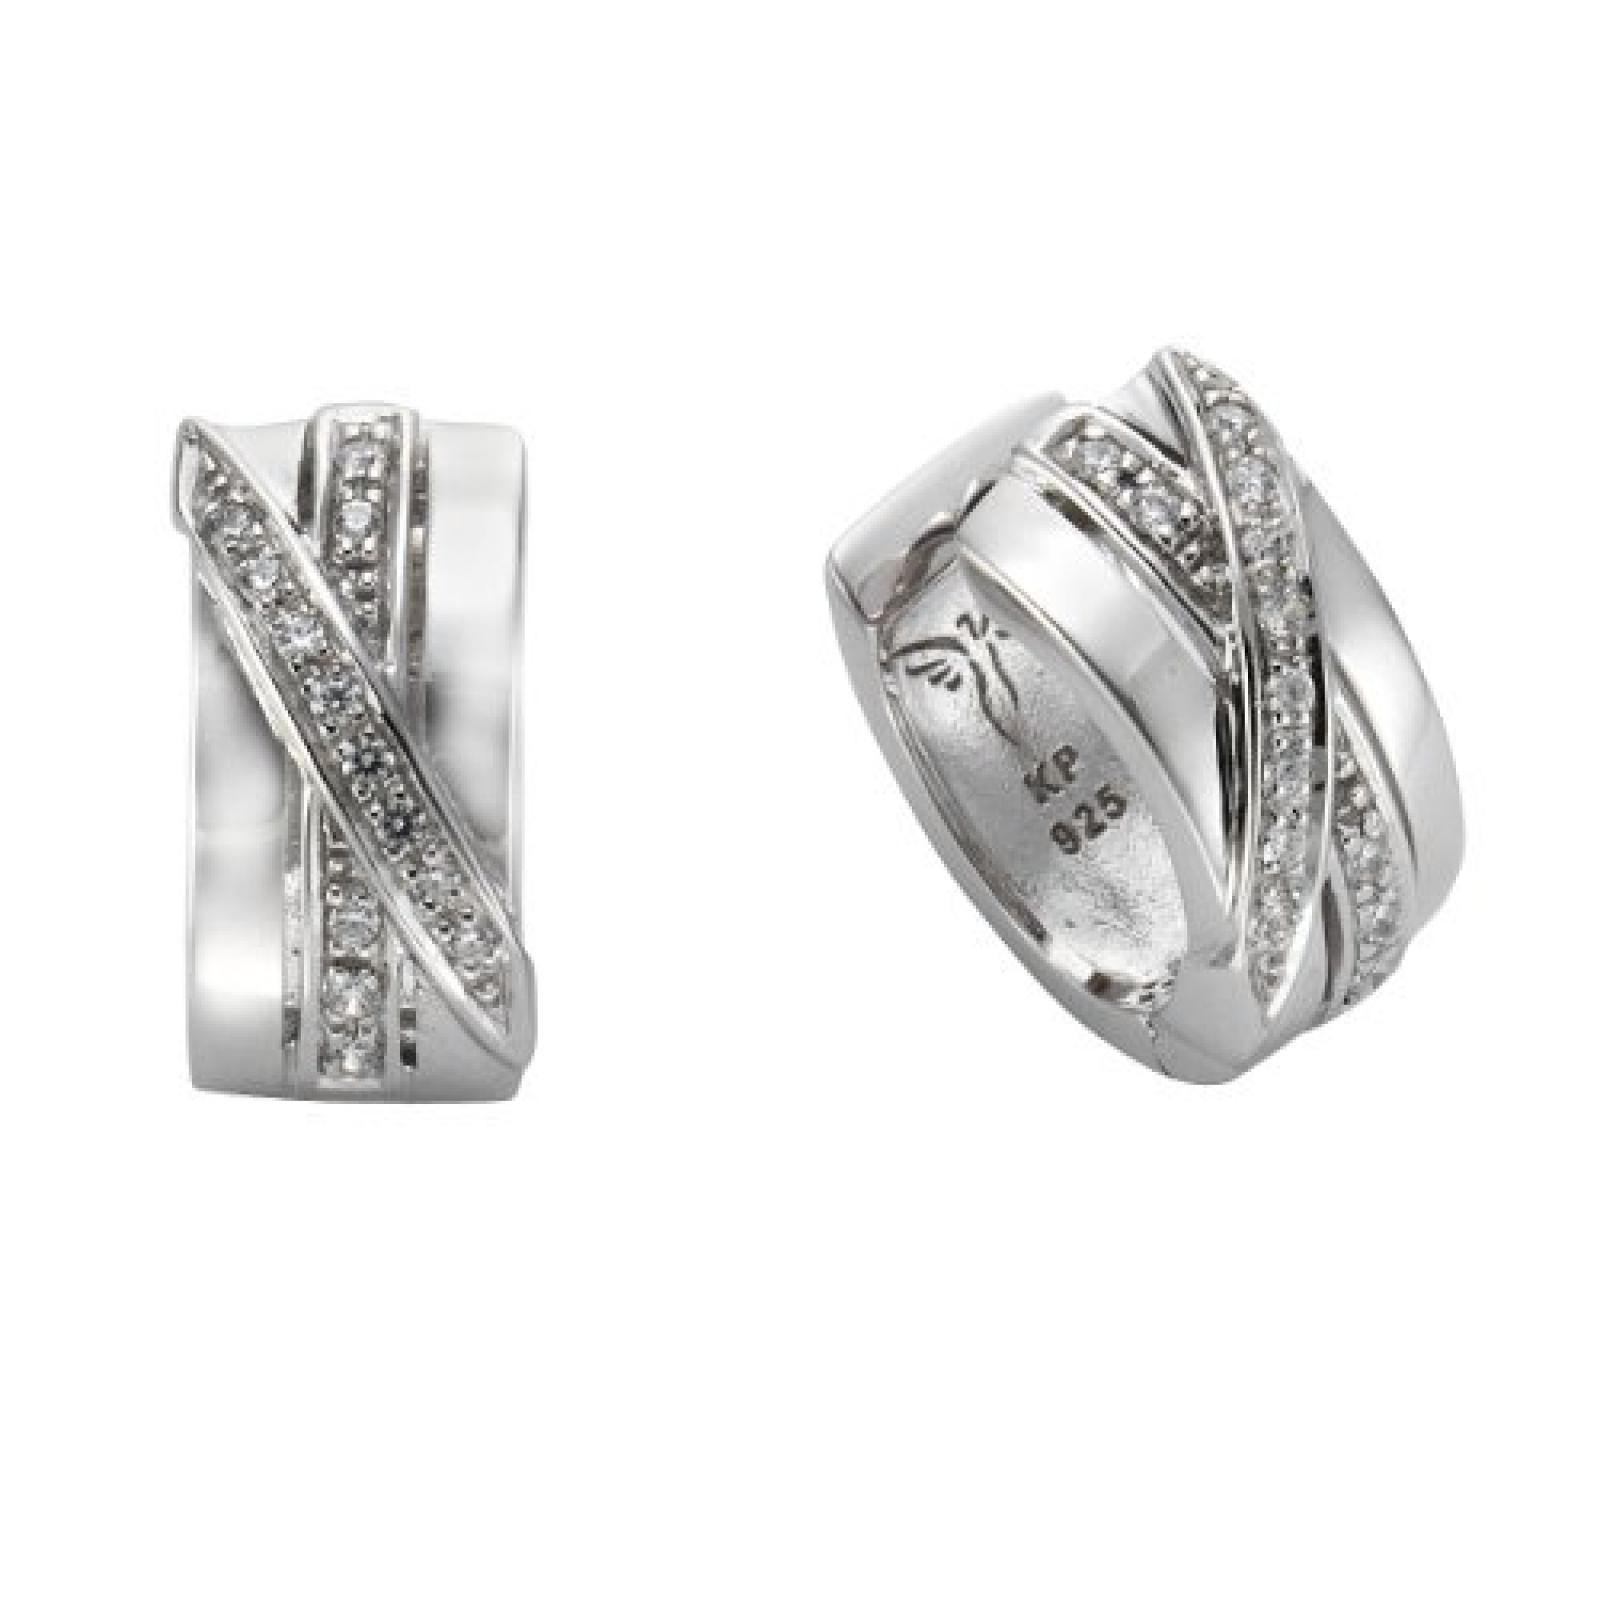 Celesta Damen-Creole 925 Sterling Silber 26 Zirkonia weiß 273210268